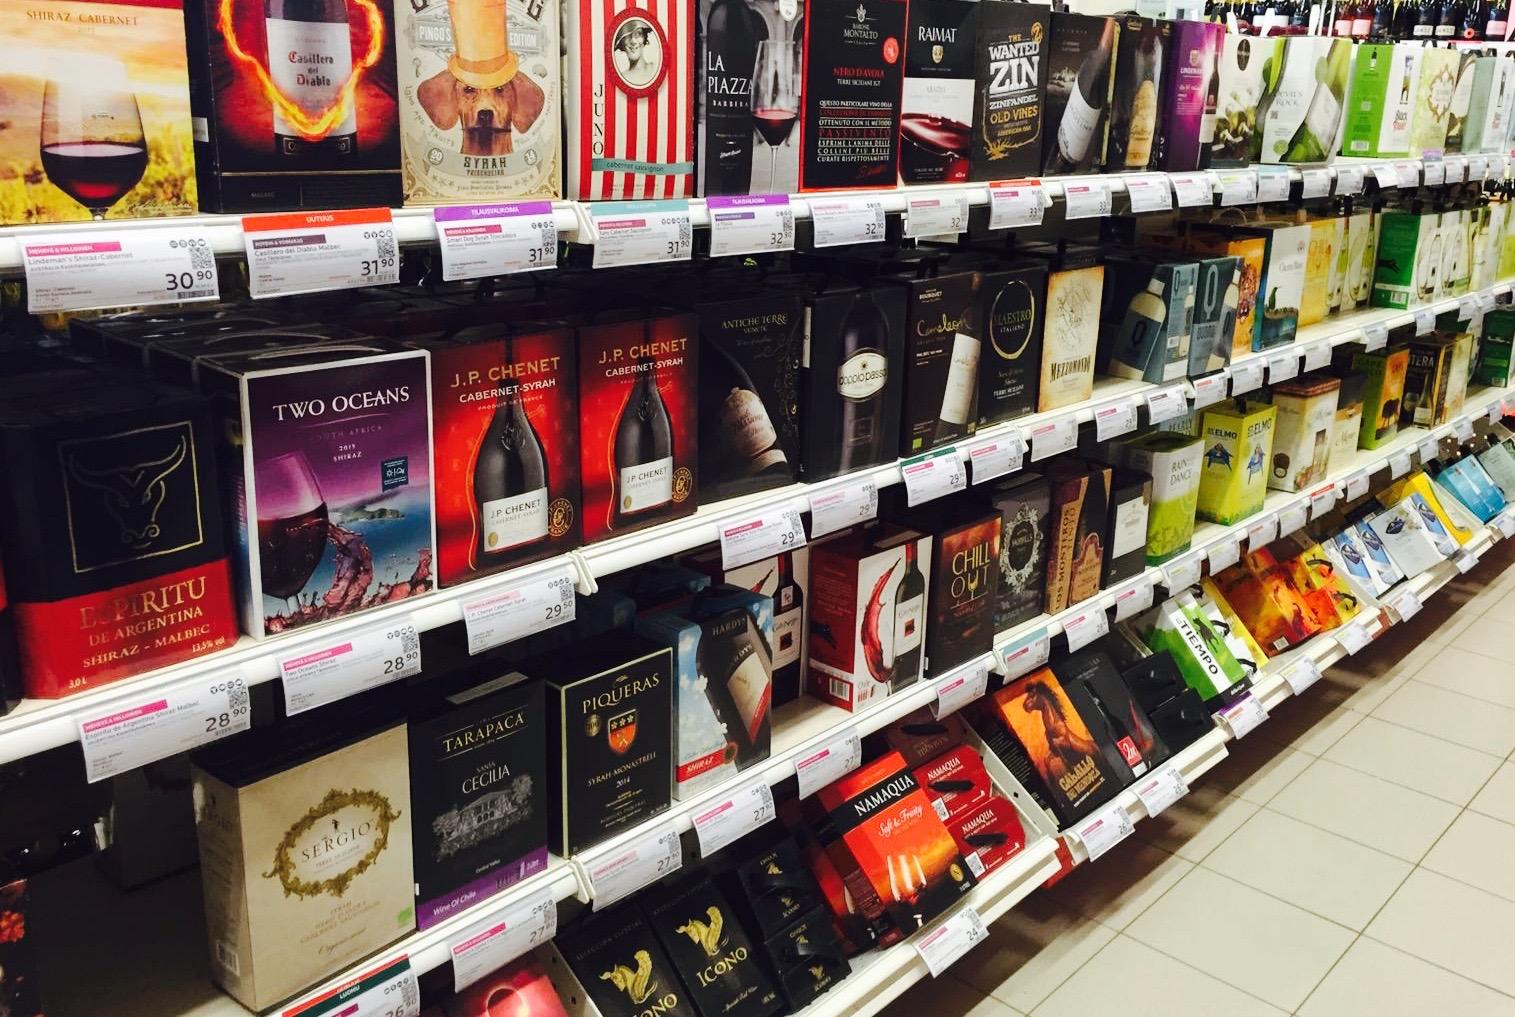 Piqueras: vino español número 1 en Finlandia